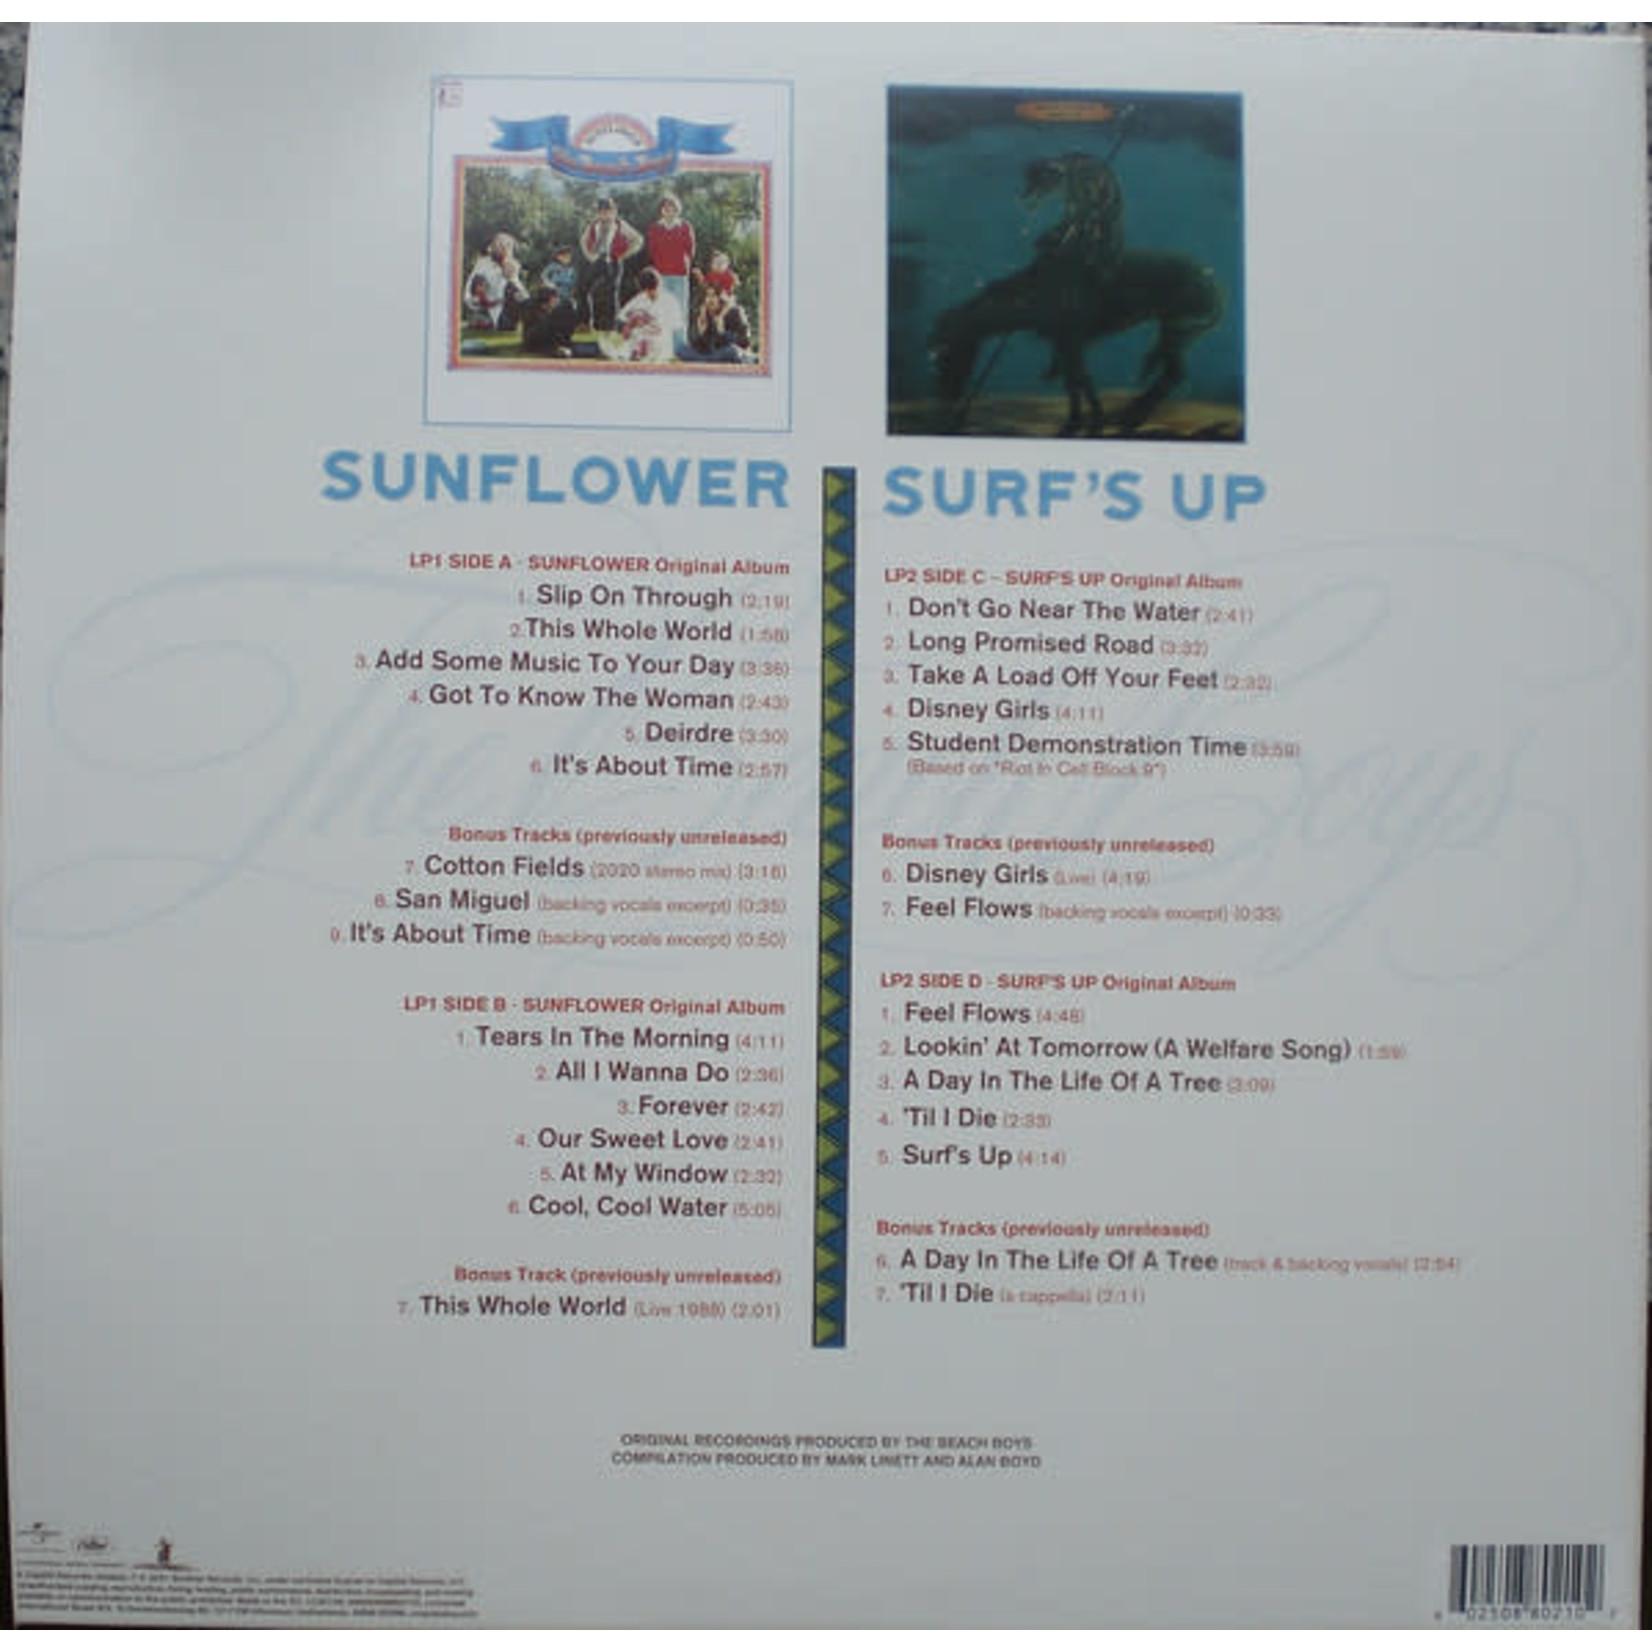 BEACH BOYS FEEL FLOWS: THE SUNFLOWER / SURF'S UP SESSIONS  (2LP)